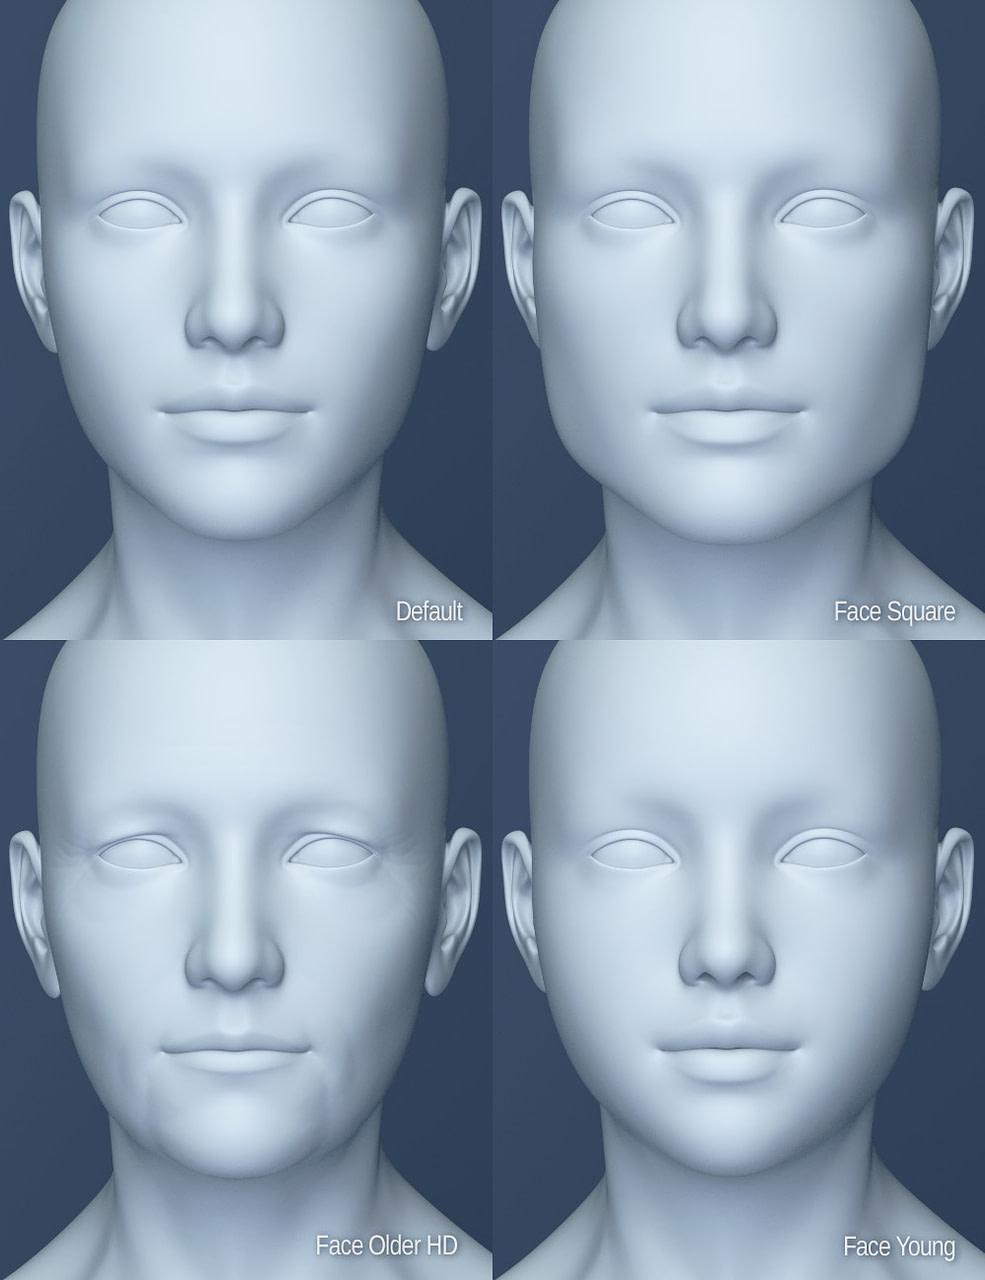 daz3d genesis 8 figure head morphs